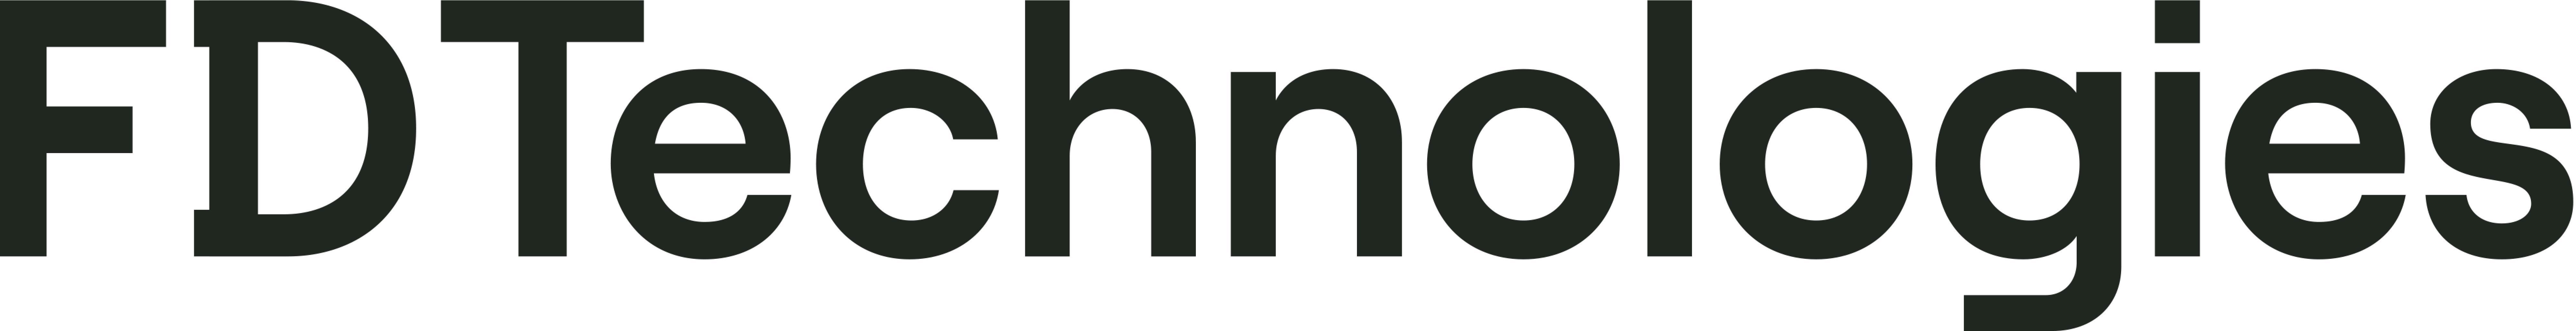 FDT_Logo.jpg